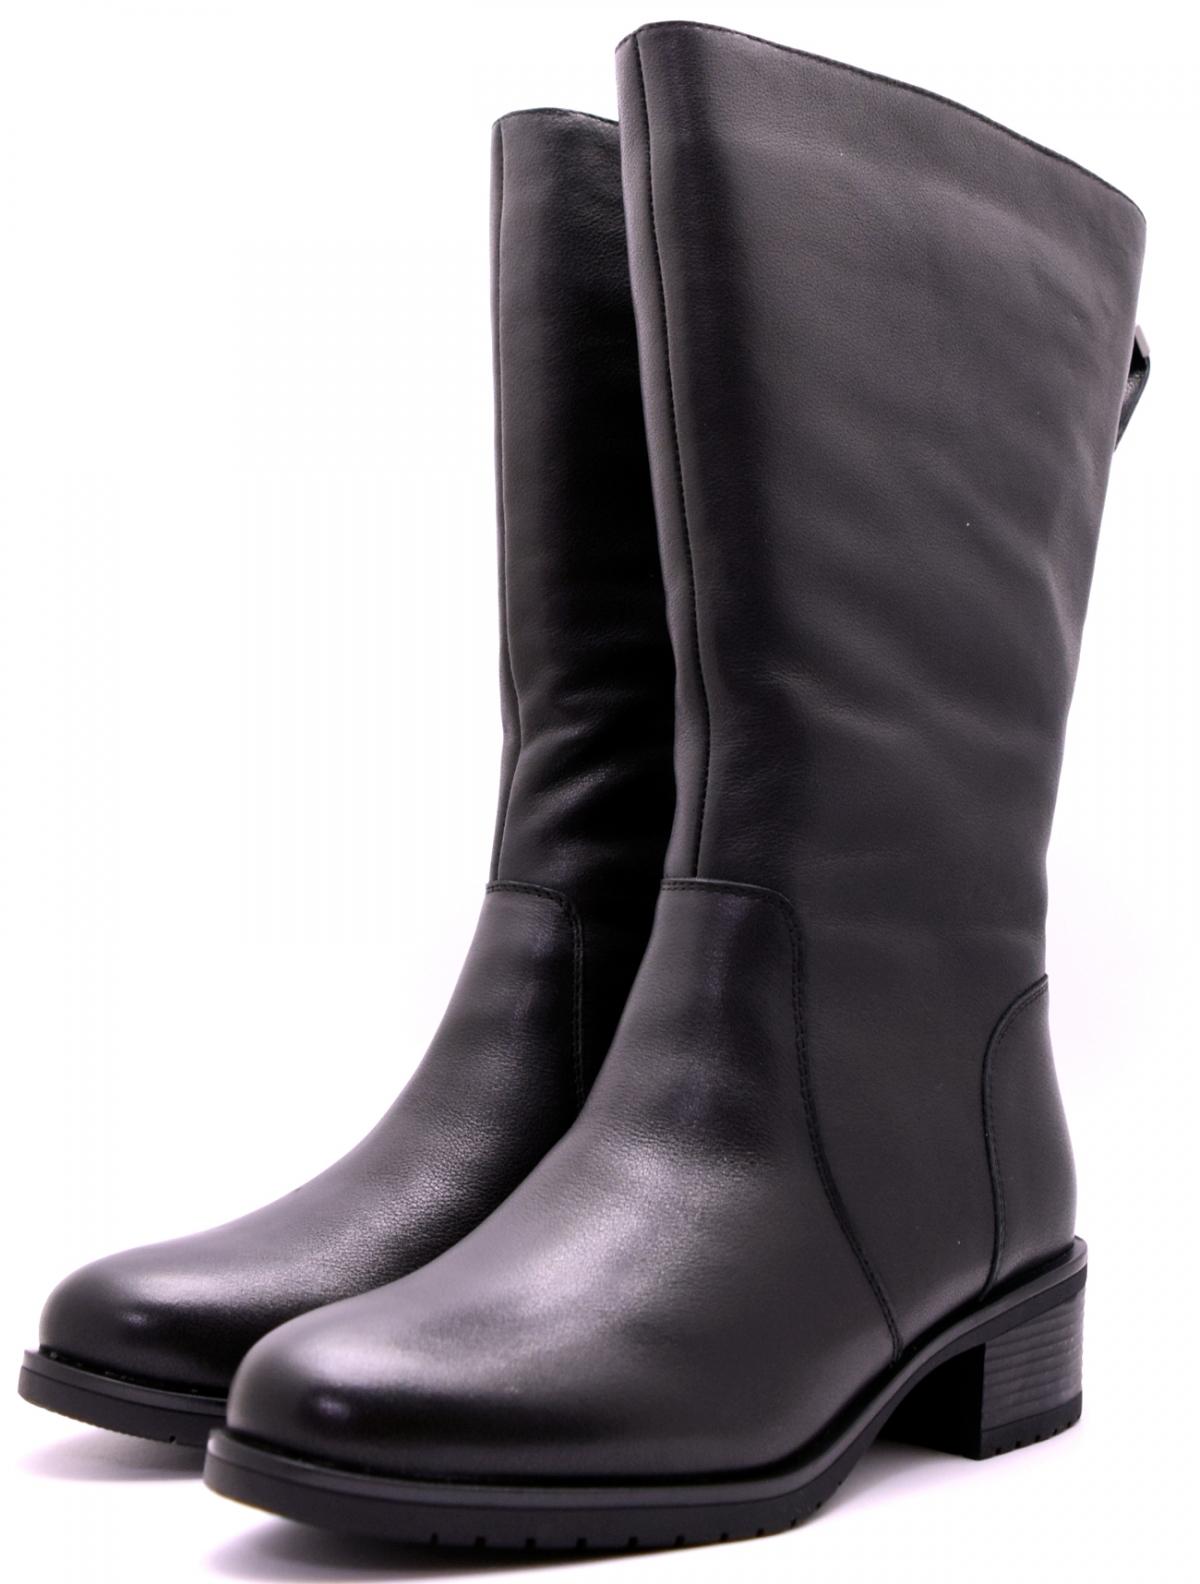 Madella XMG-02076-1A-KW женские сапоги